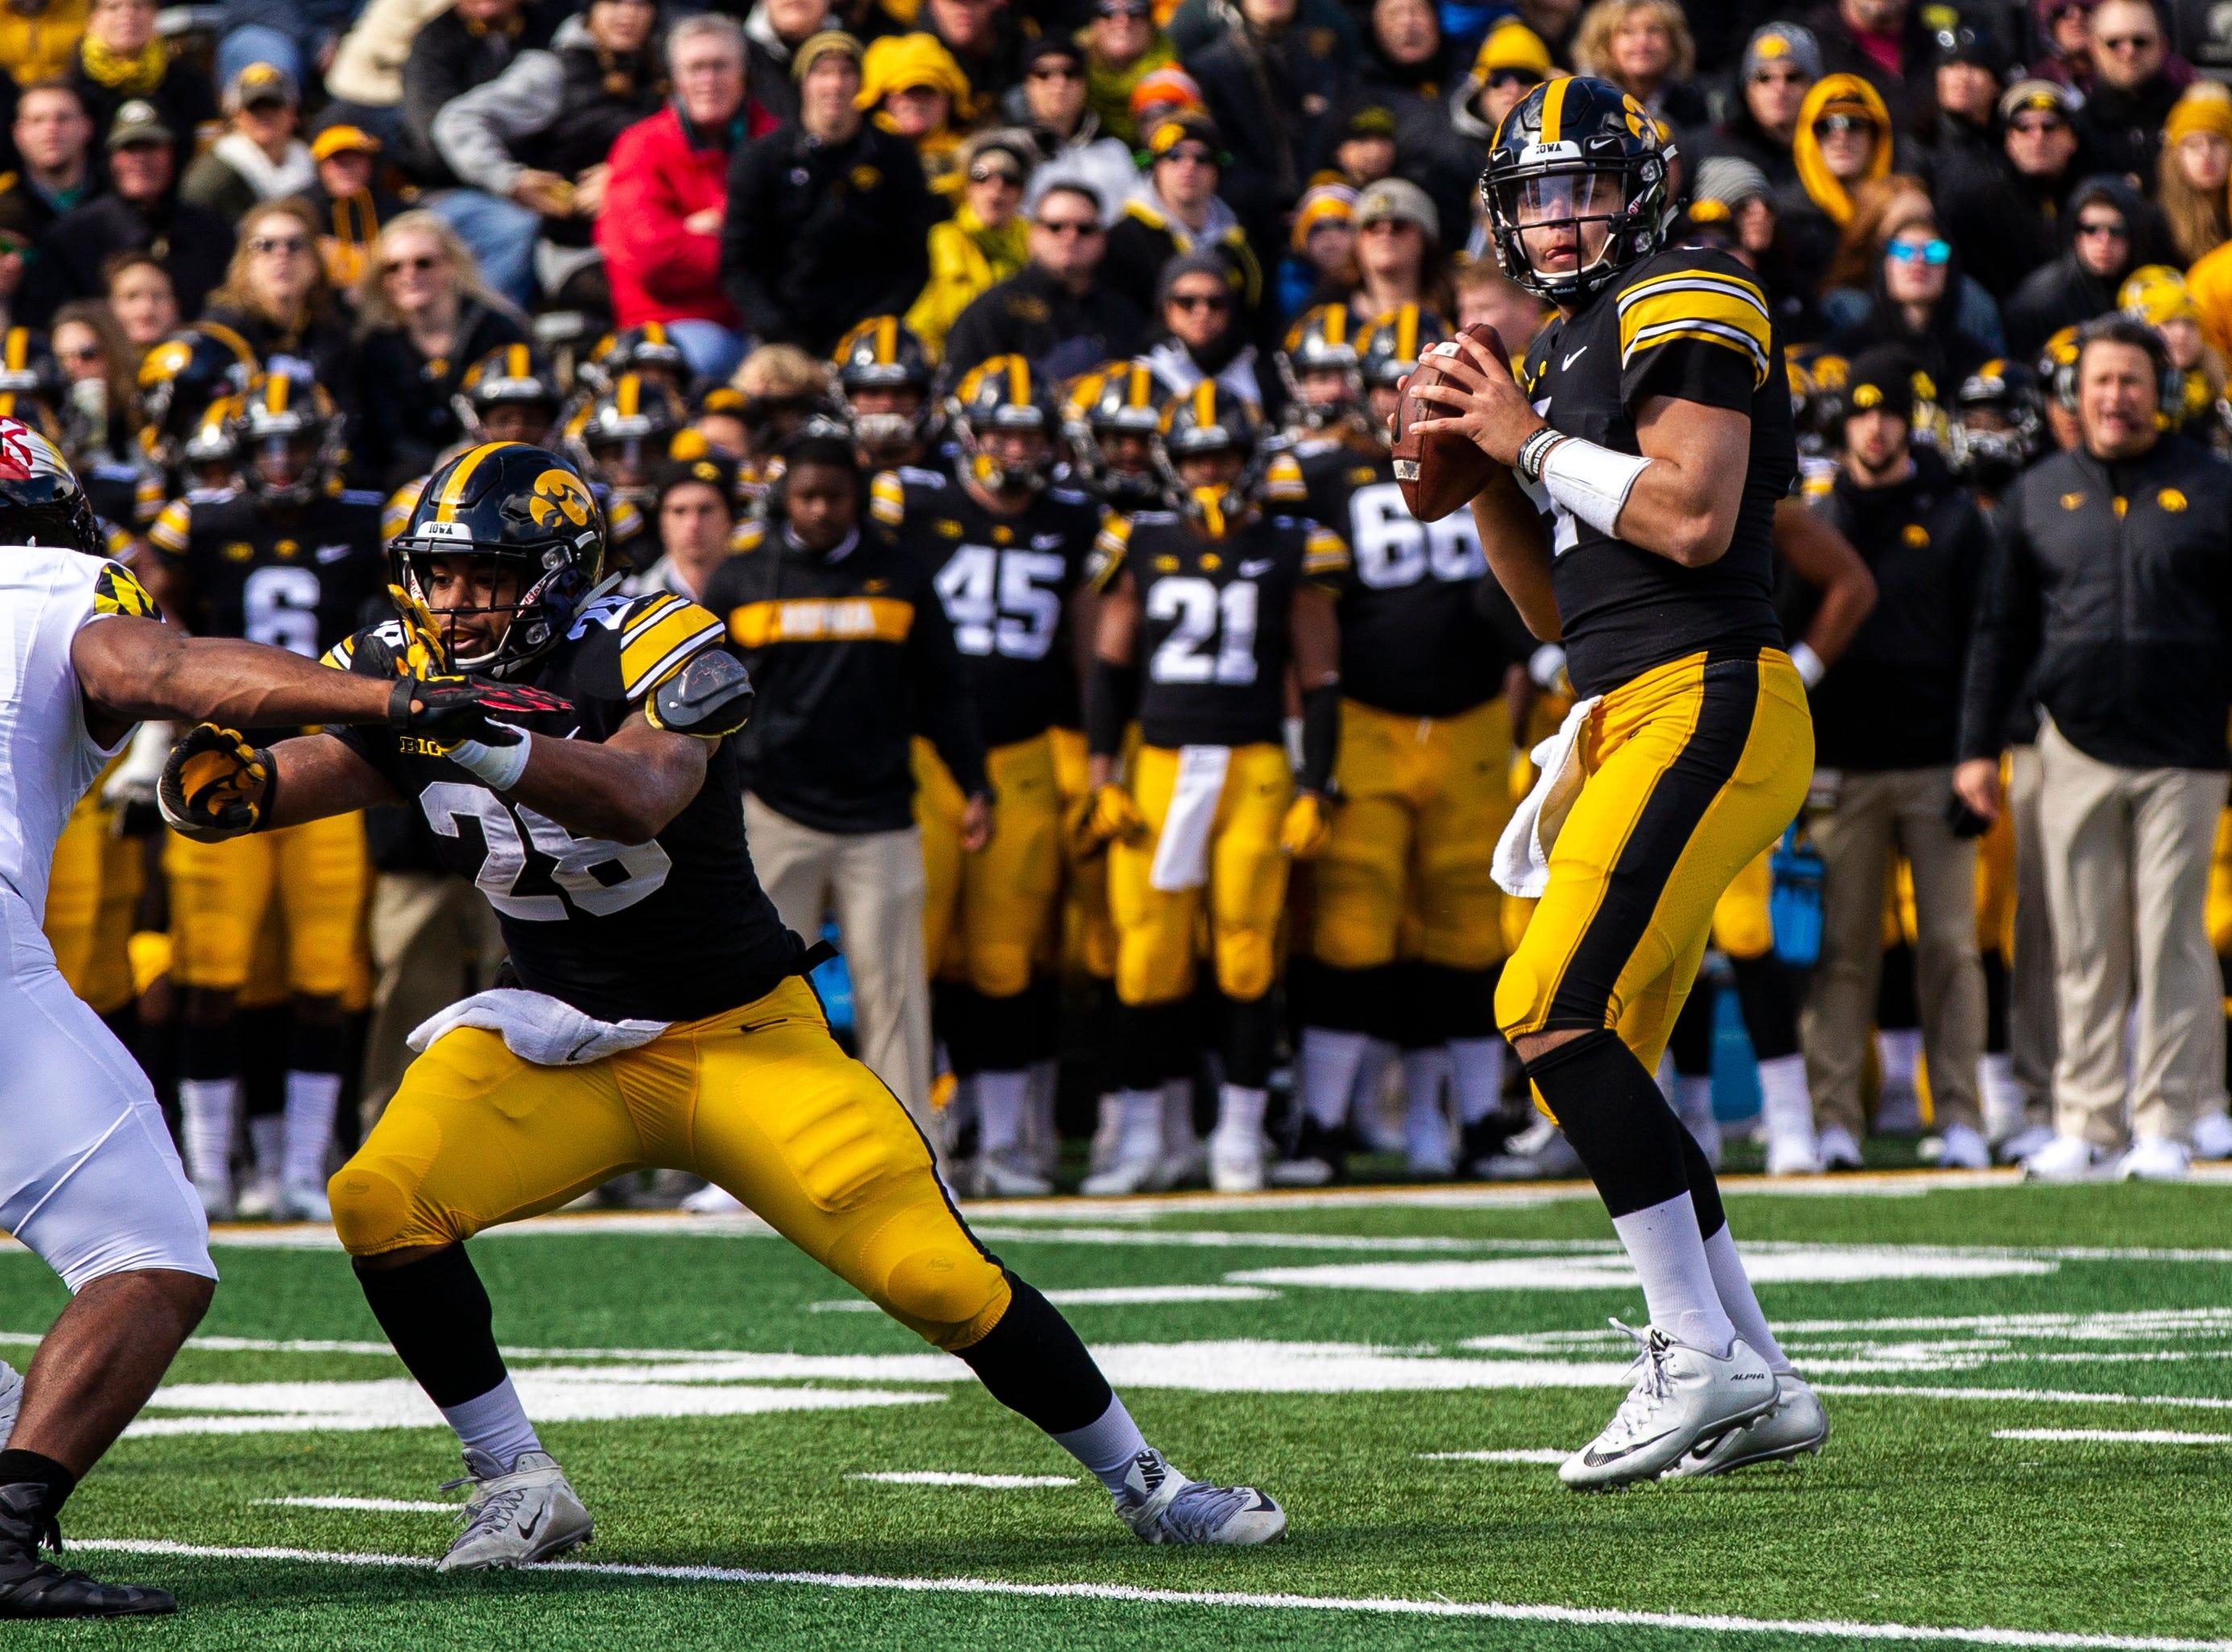 Iowa quarterback Nate Stanley (4) looks to pass while Iowa running back Toren Young (28) blocks Maryland linebacker Nnamdi Egbuaba (31) during an NCAA Big Ten conference football game on Saturday, Oct. 20, 2018, at Kinnick Stadium in Iowa City.